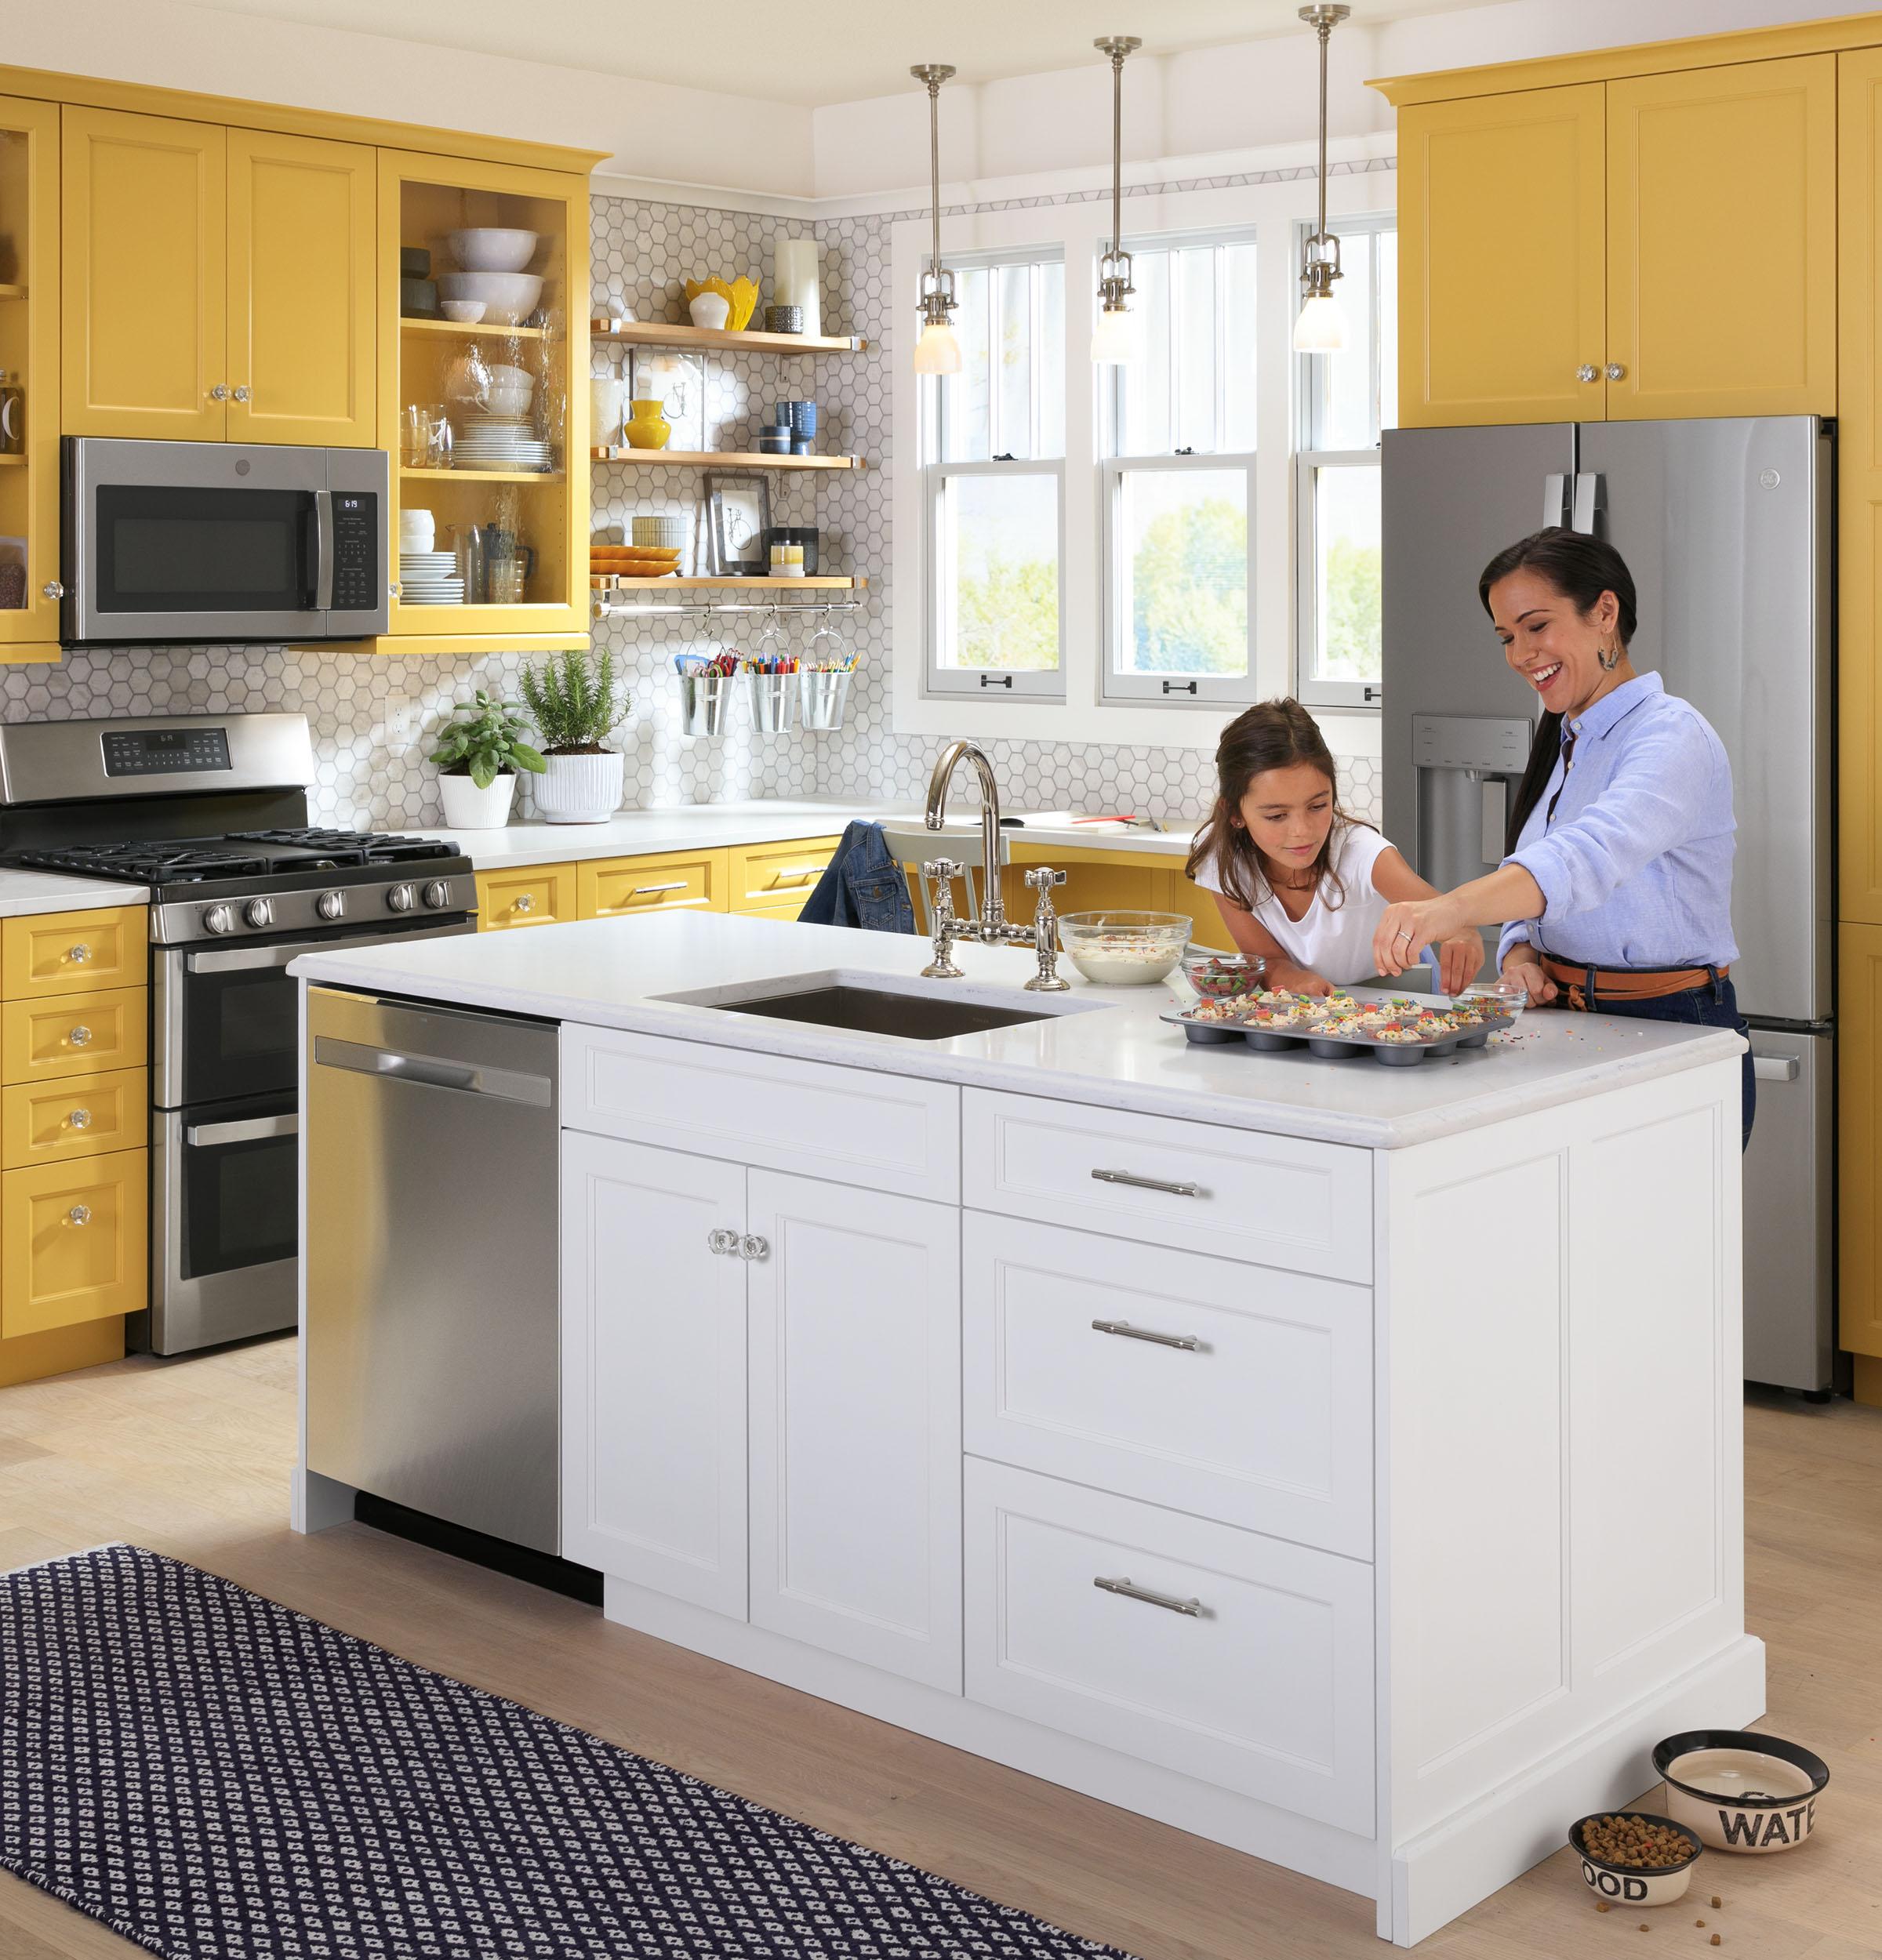 Model: JVM6175YKFS | GE GE® 1.7 Cu. Ft. Over-the-Range Sensor Fingerprint Resistant Microwave Oven